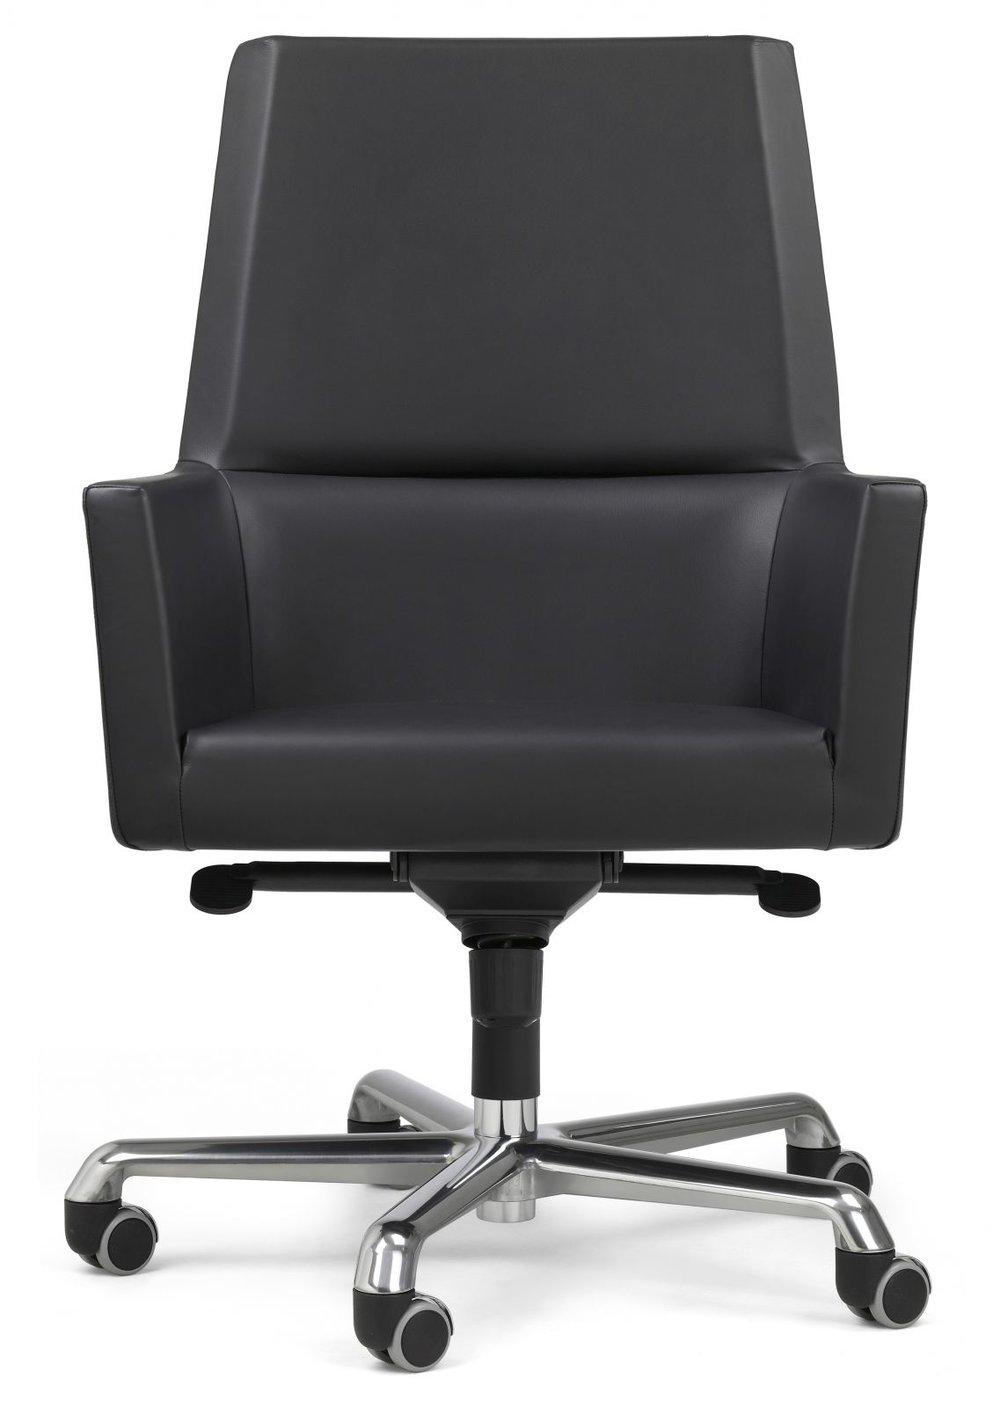 modern-office-chairs-Italian-furniture-designer-chairs (8).jpg